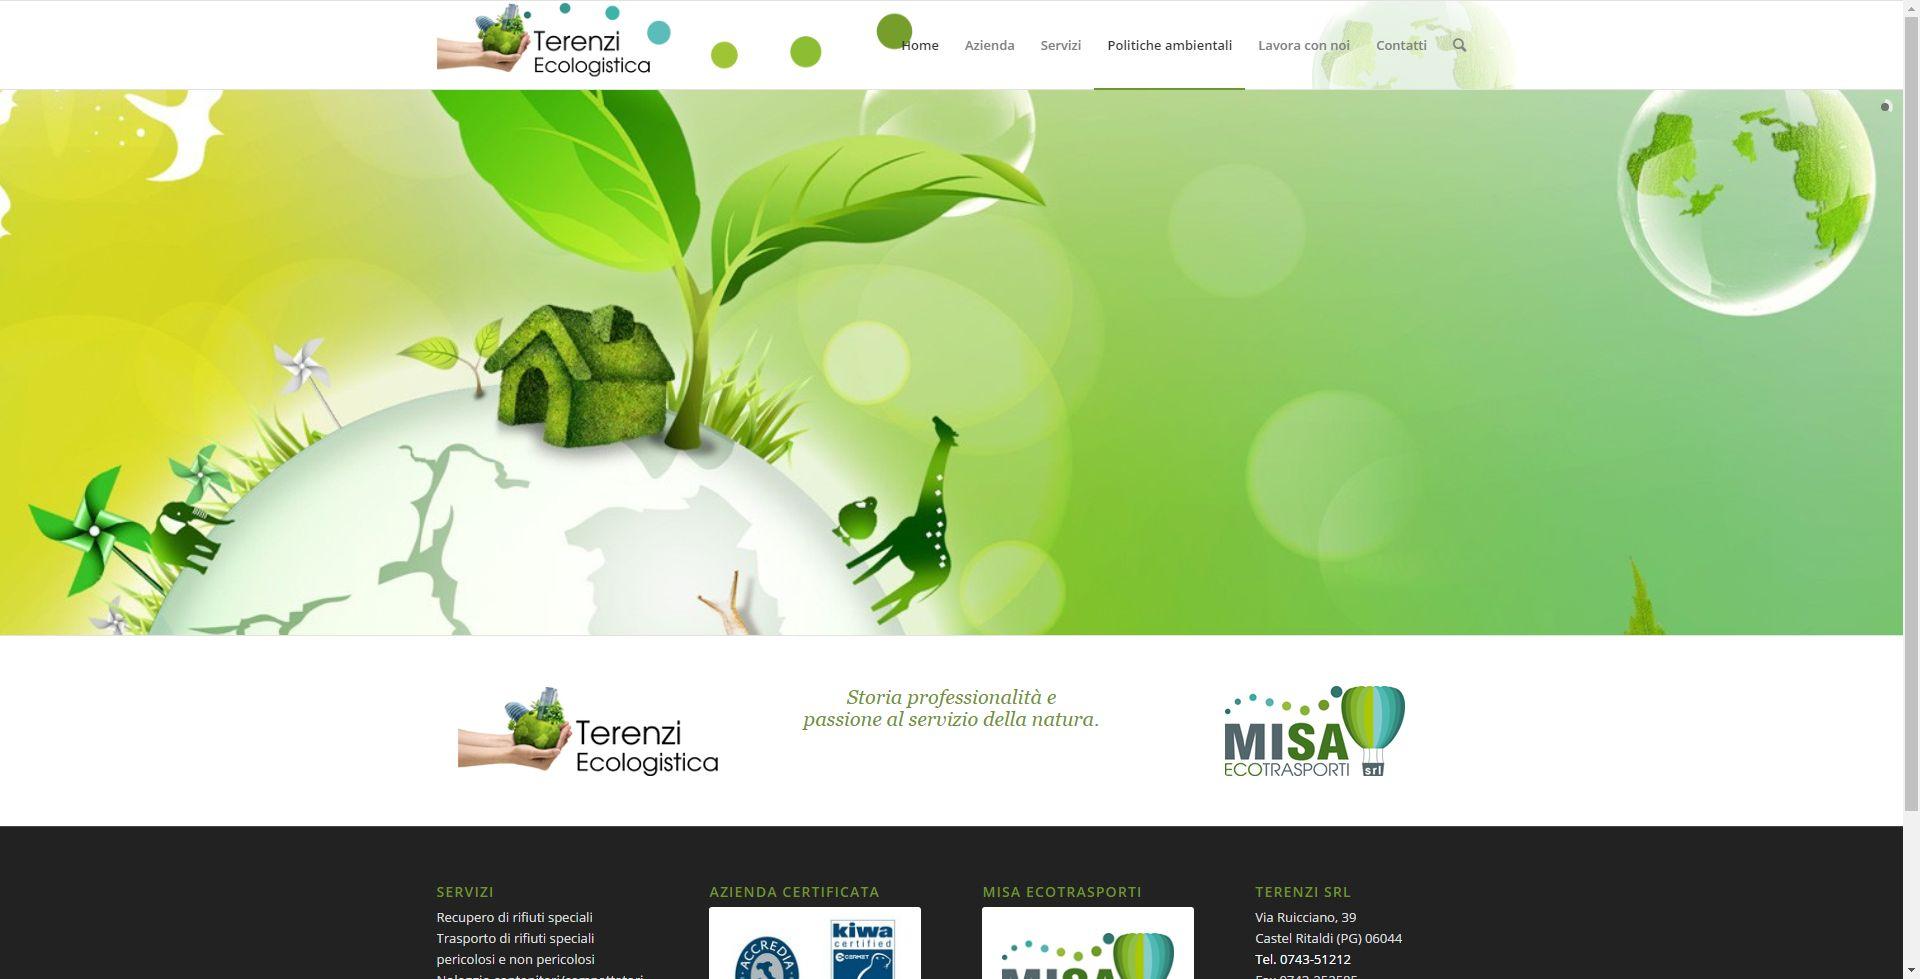 Terenzi Ecologistica